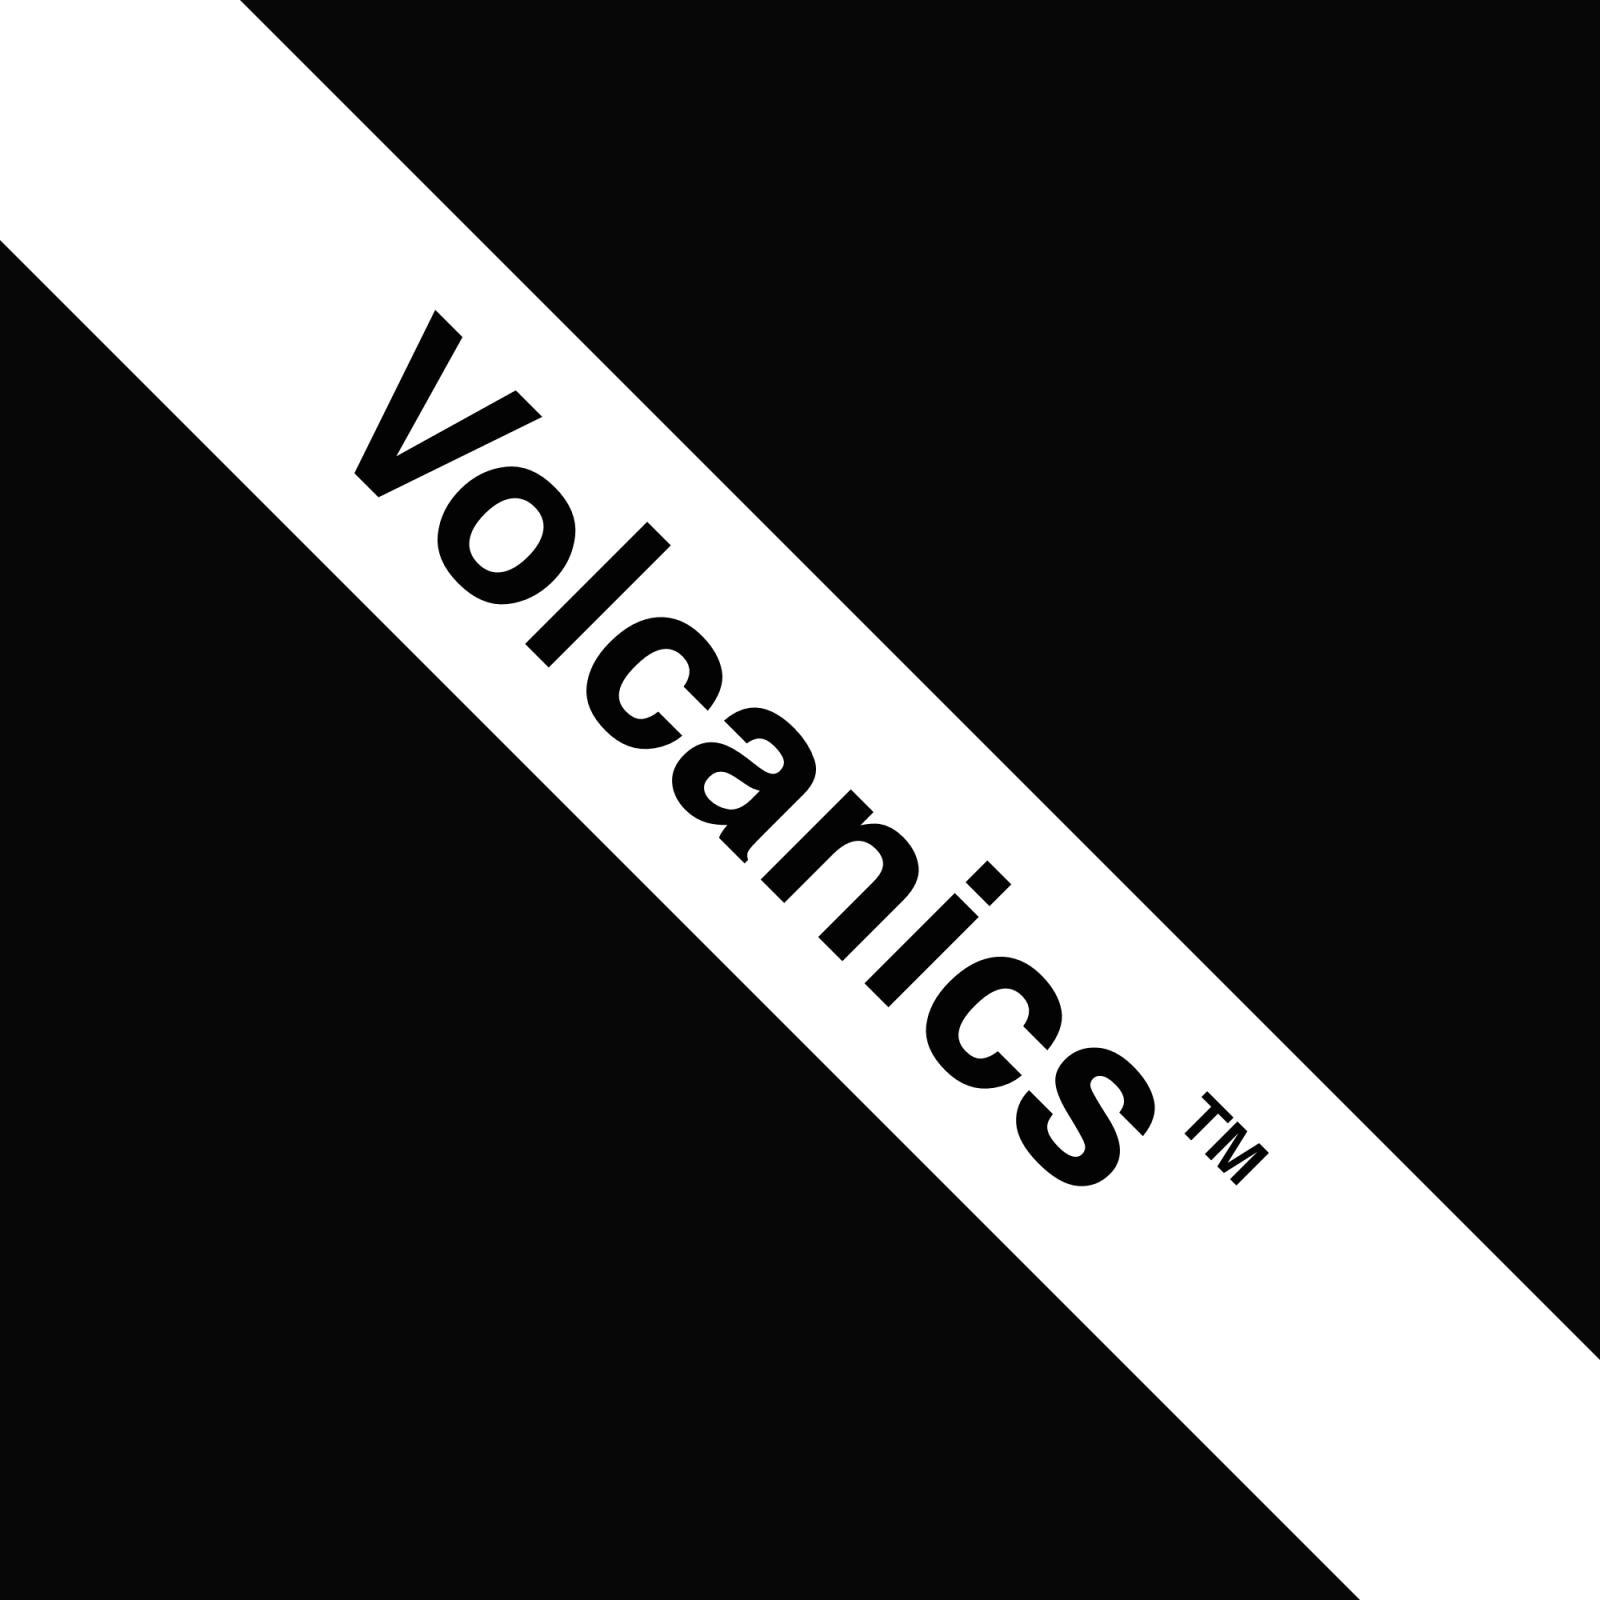 Volcanics's logo